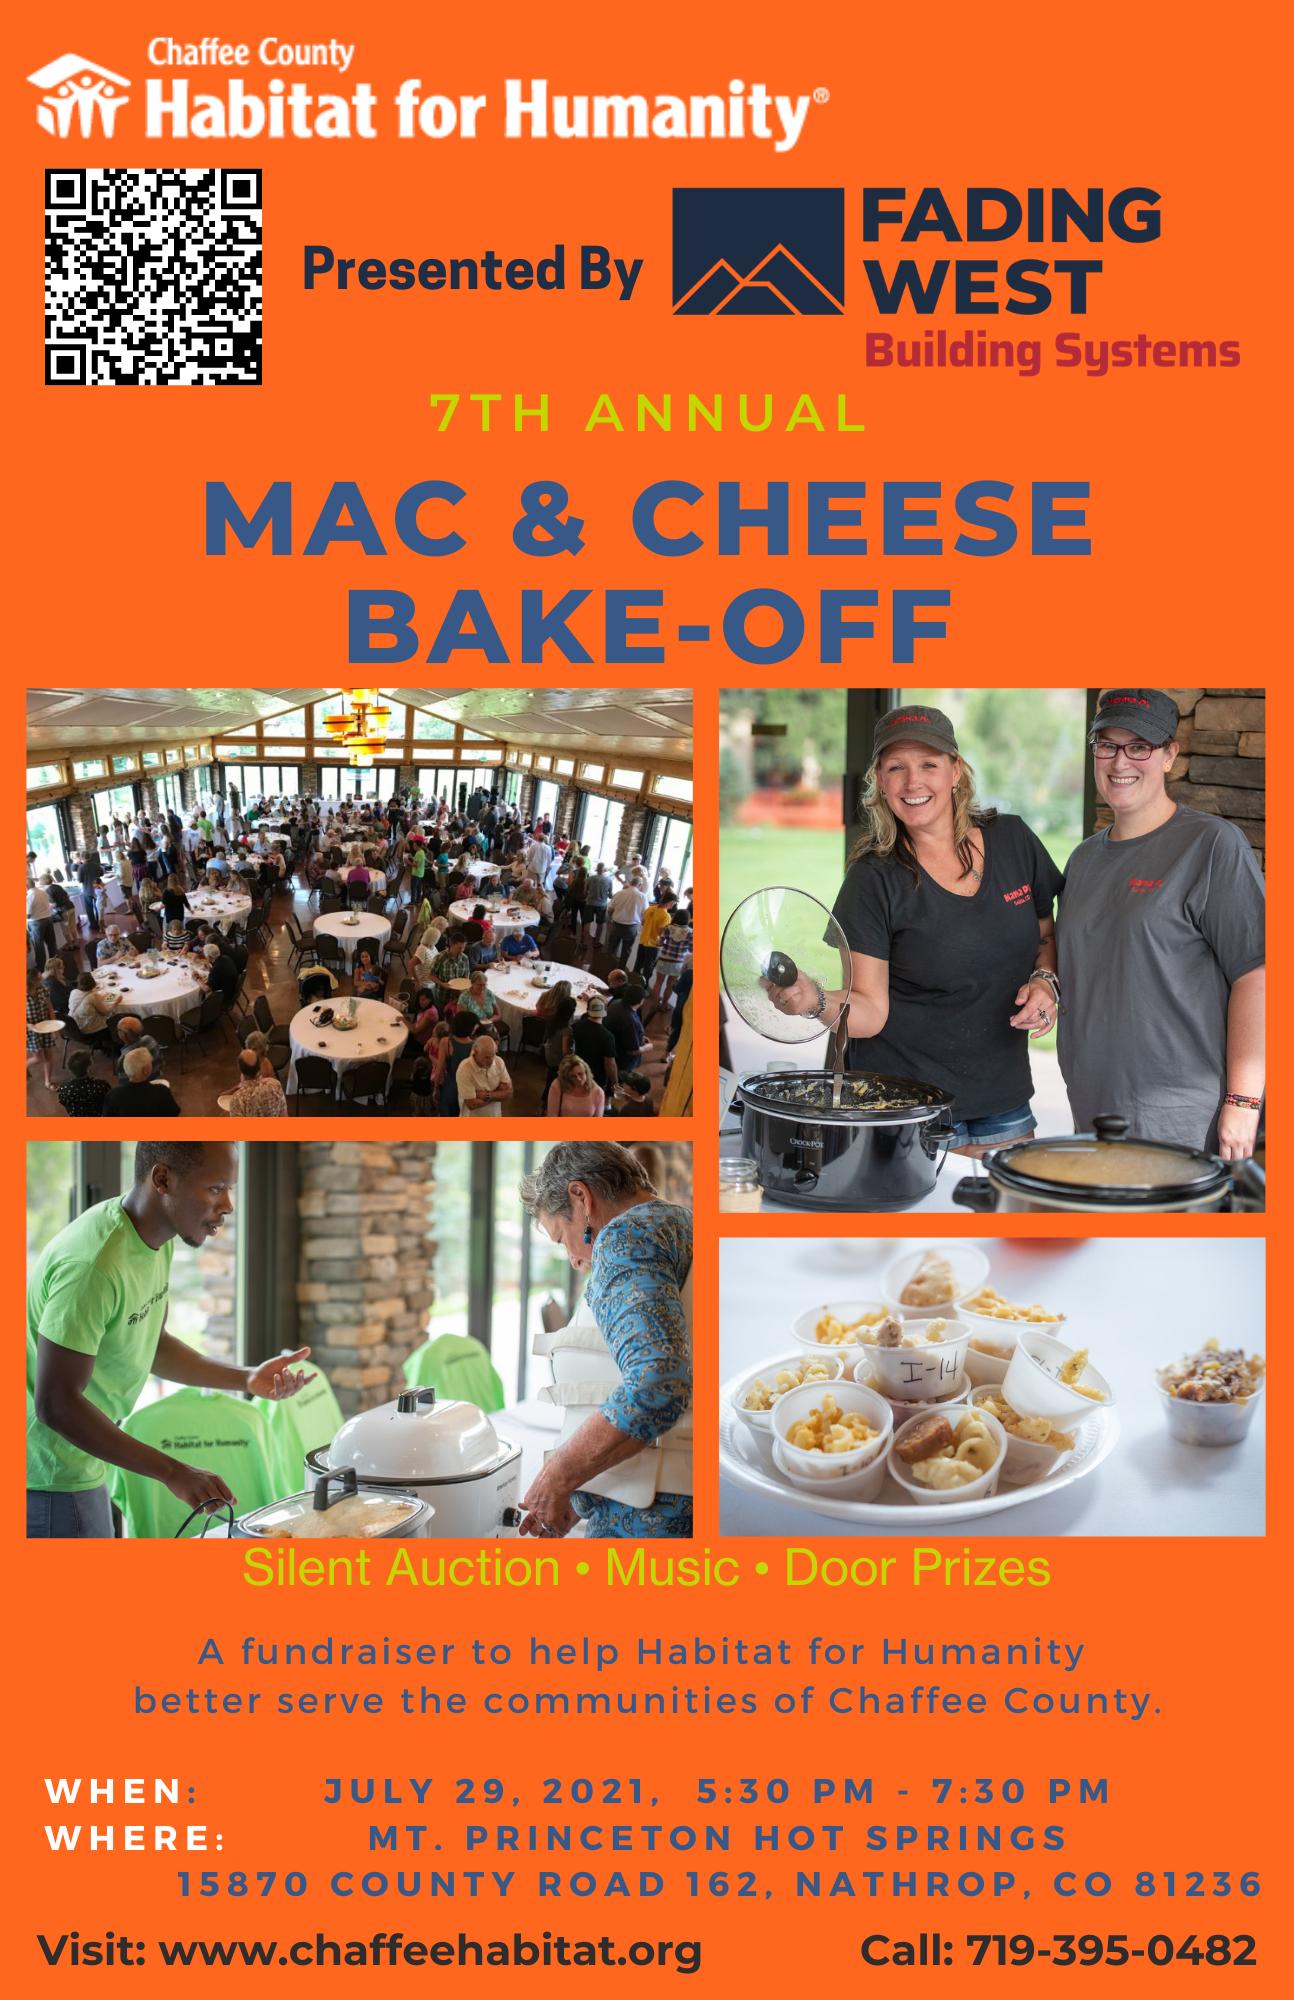 Mac & Cheese Bake-Off Details